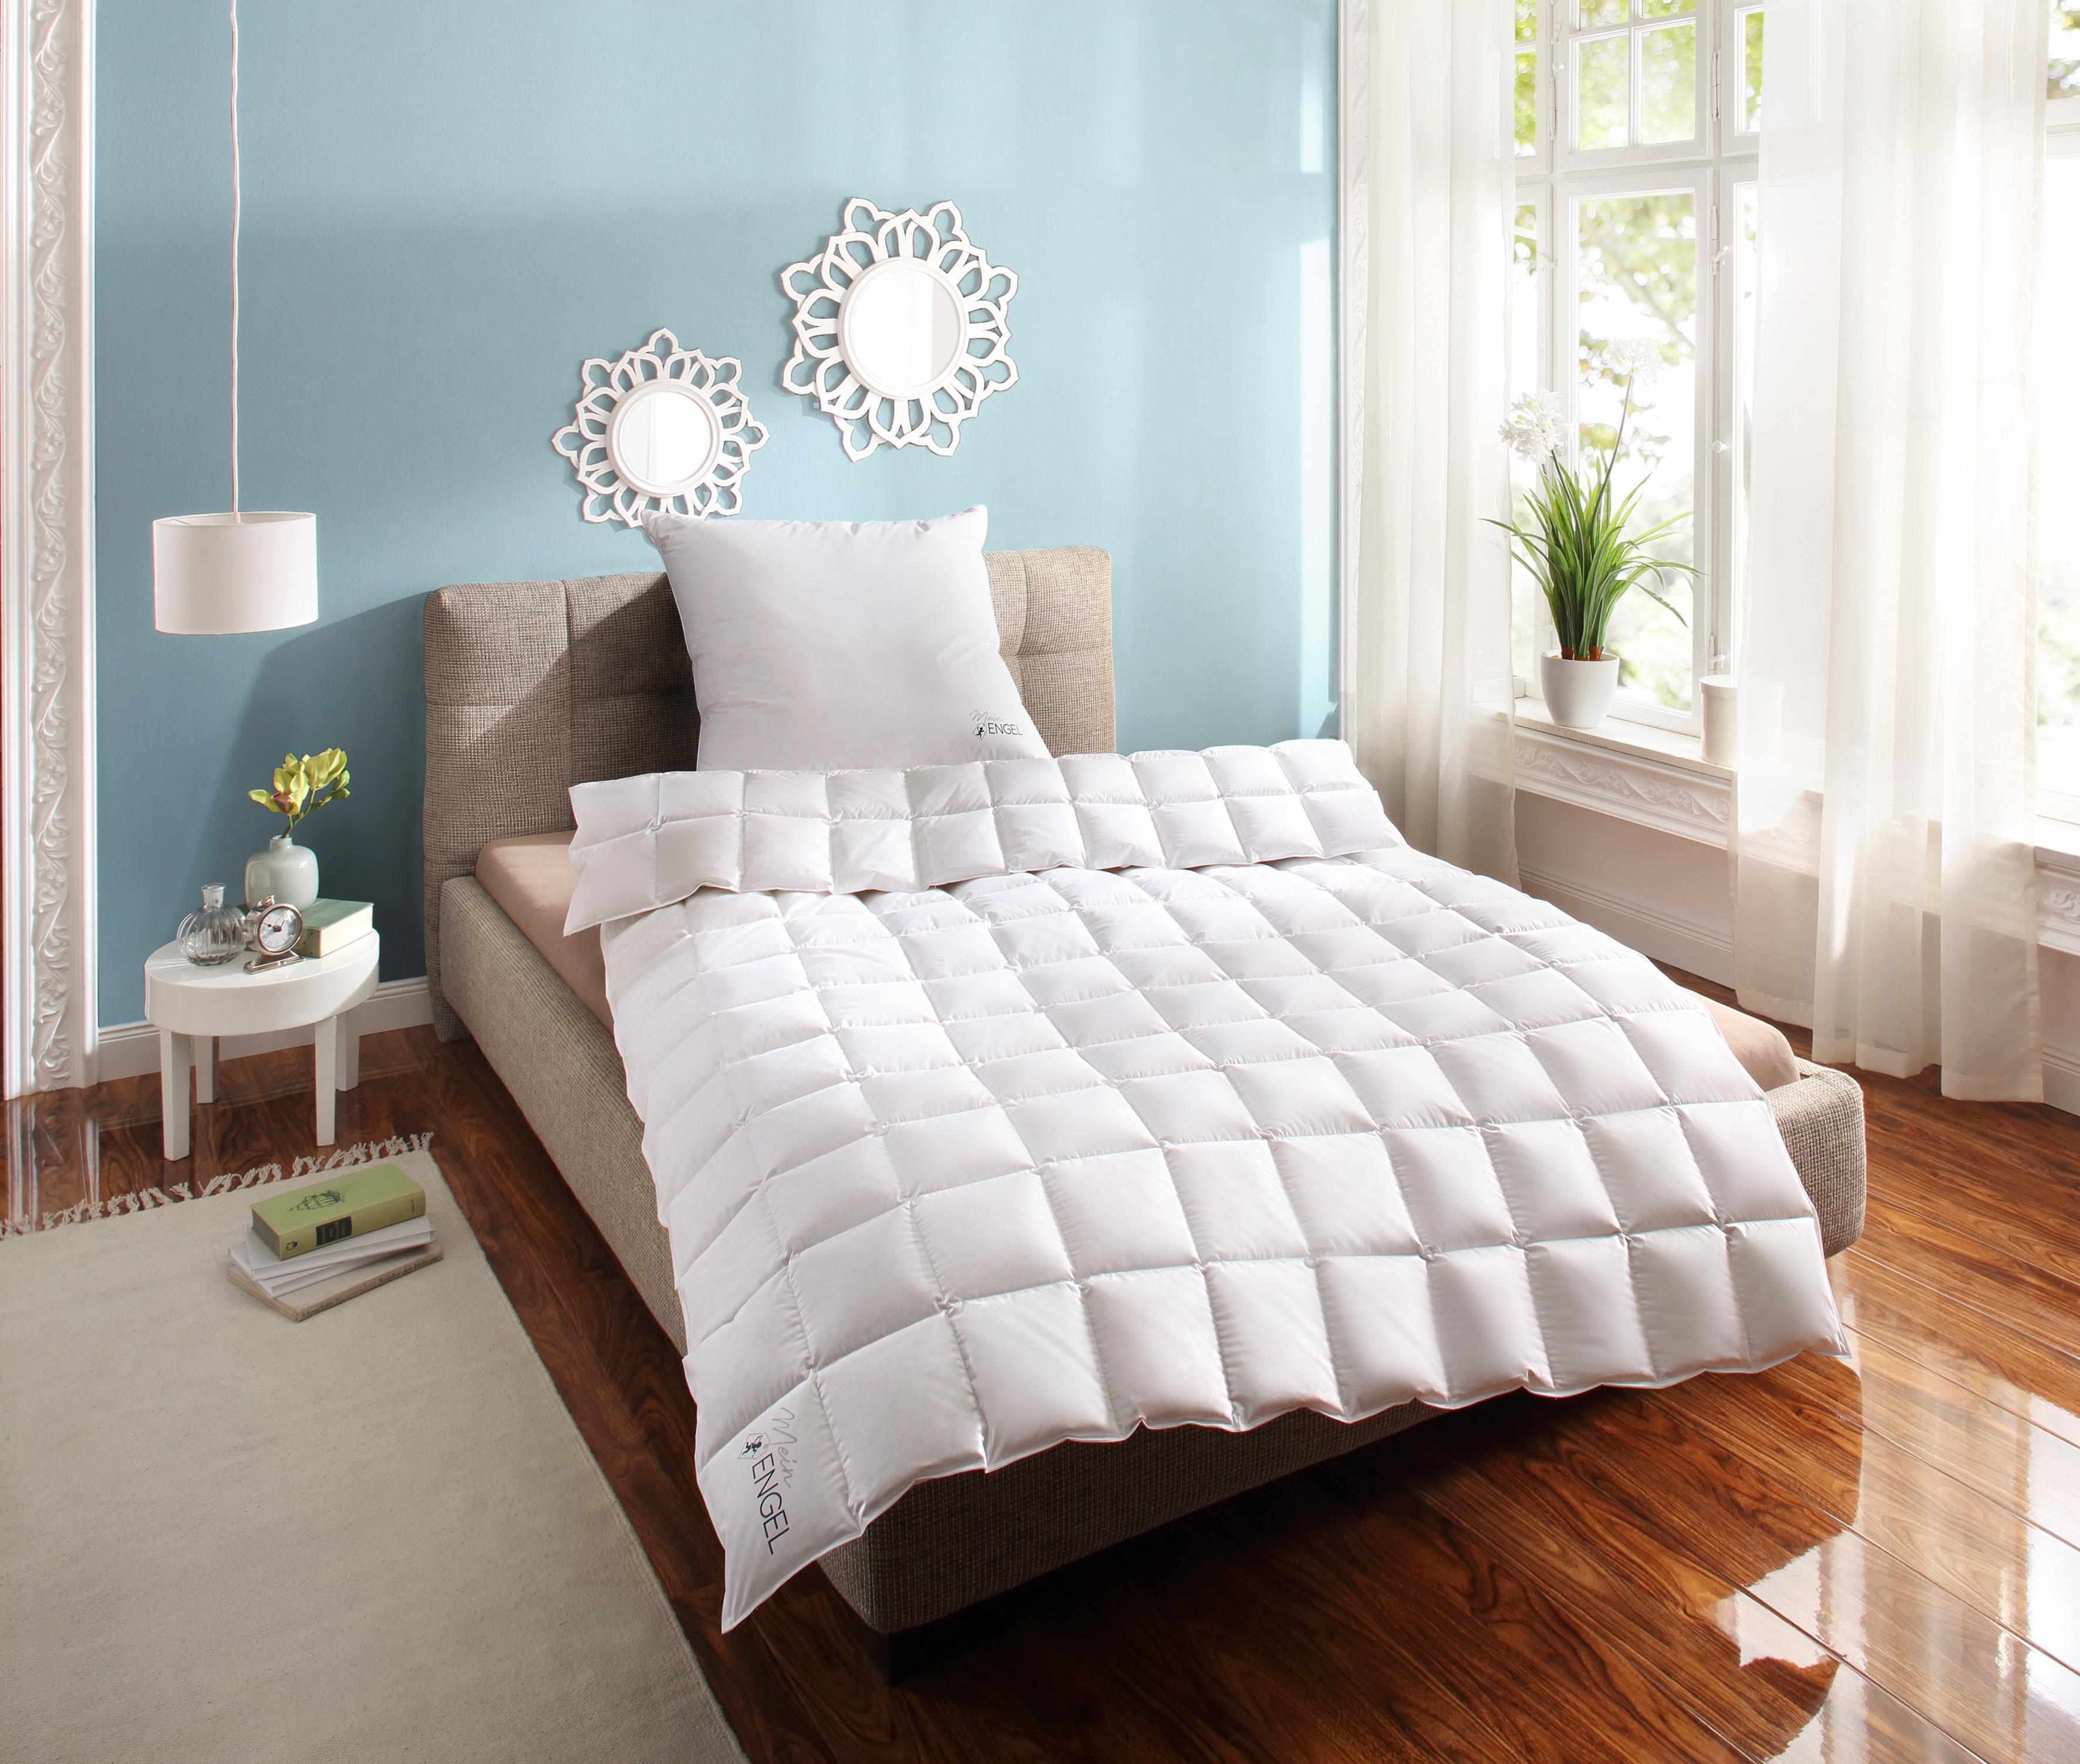 Daunenbettdecke Mein Engel Schlafstil leicht Füllung: 100% Gänsedaunen Bezug: 100% Baumwolle